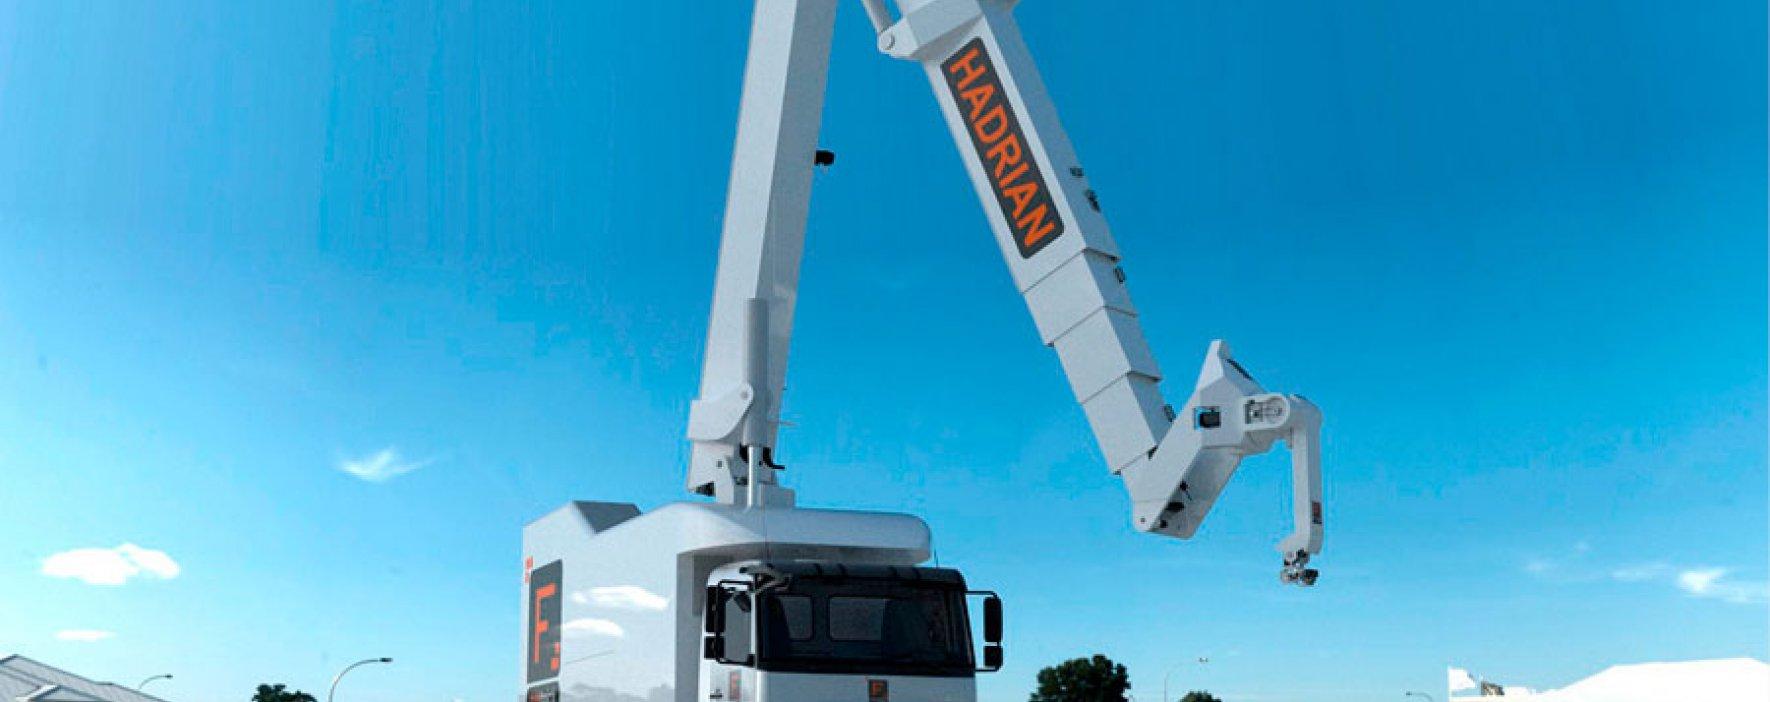 Robot obrero revolucionará la industria albañil